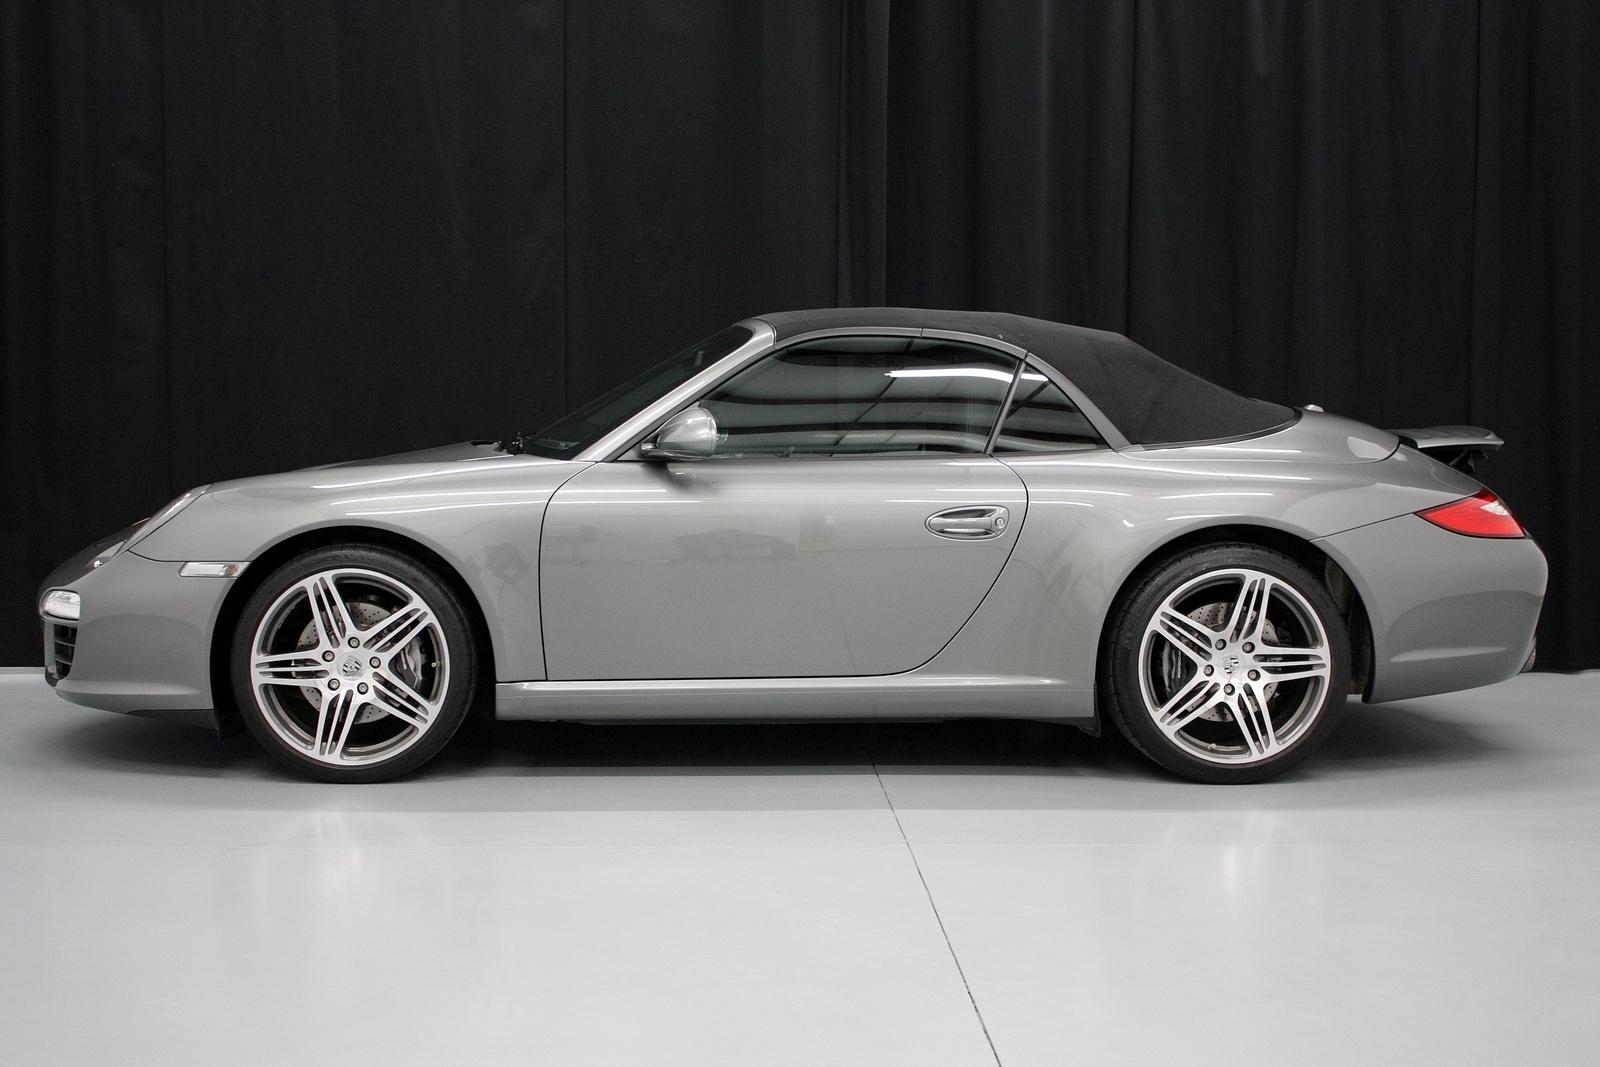 2009 Porsche 911 - Pictures